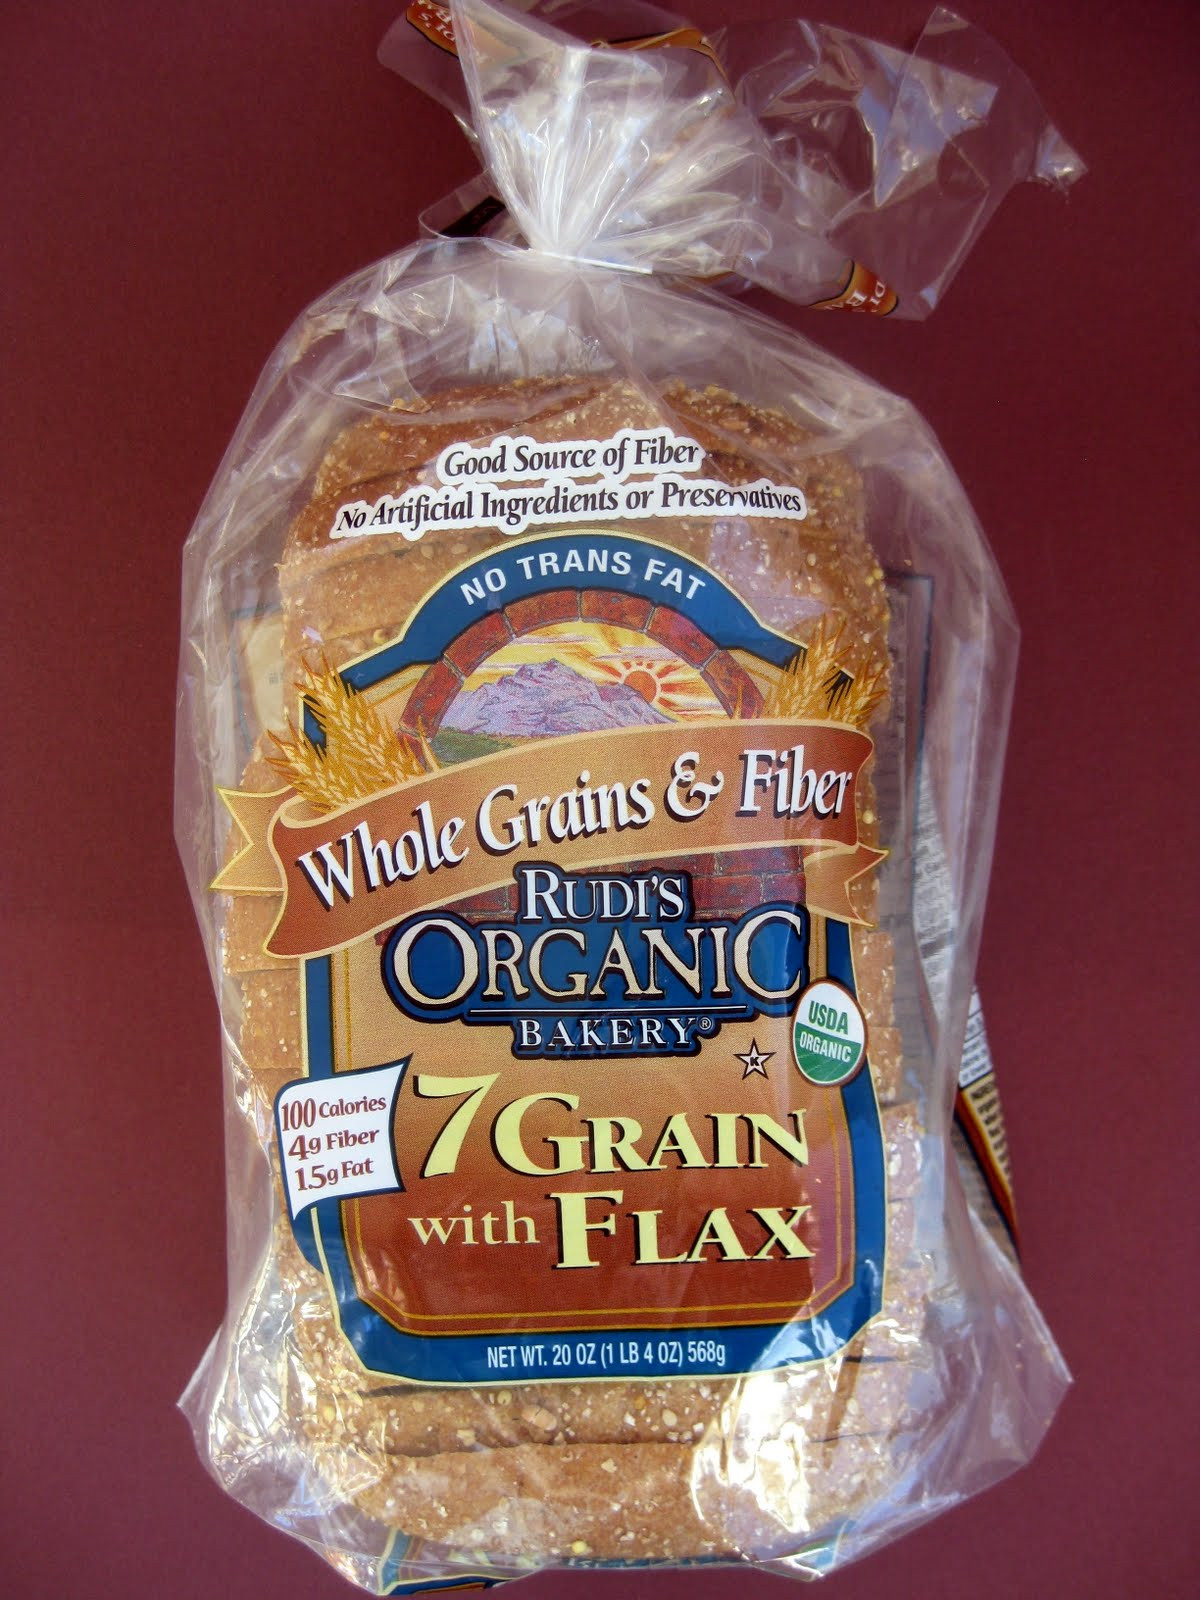 Vegan Bread Brands  The Laziest Vegans in the World Rudi s Organic Bakery 7